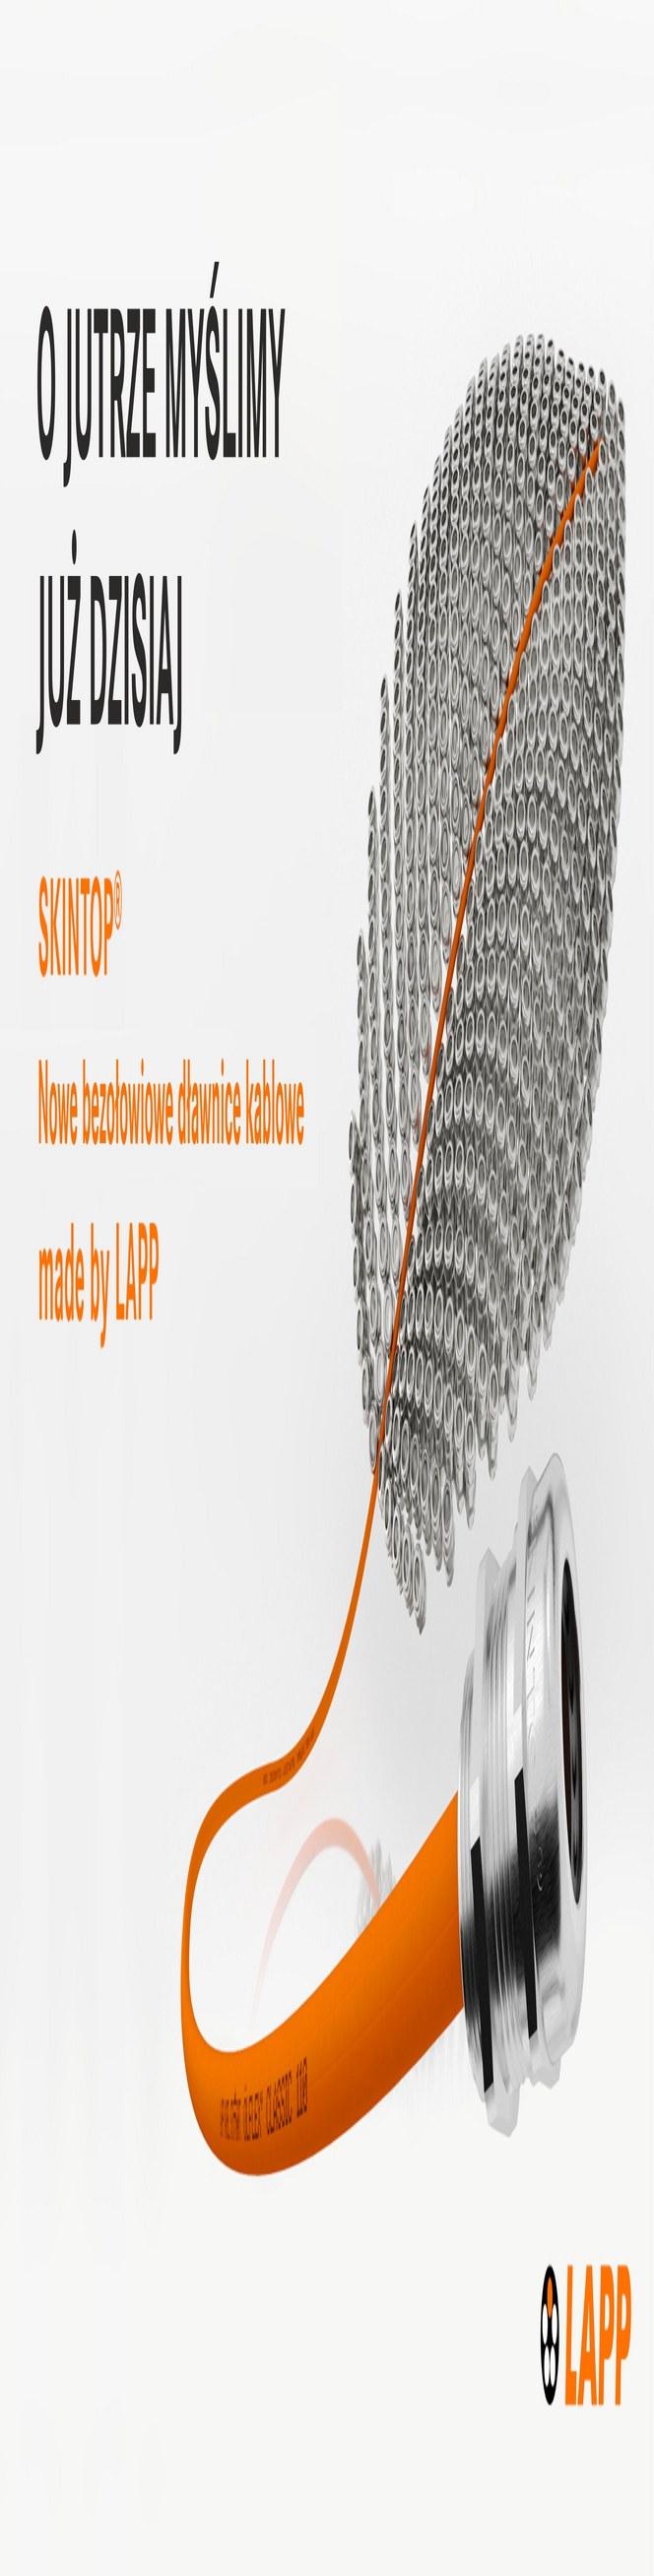 06082020 Skintop lead free main